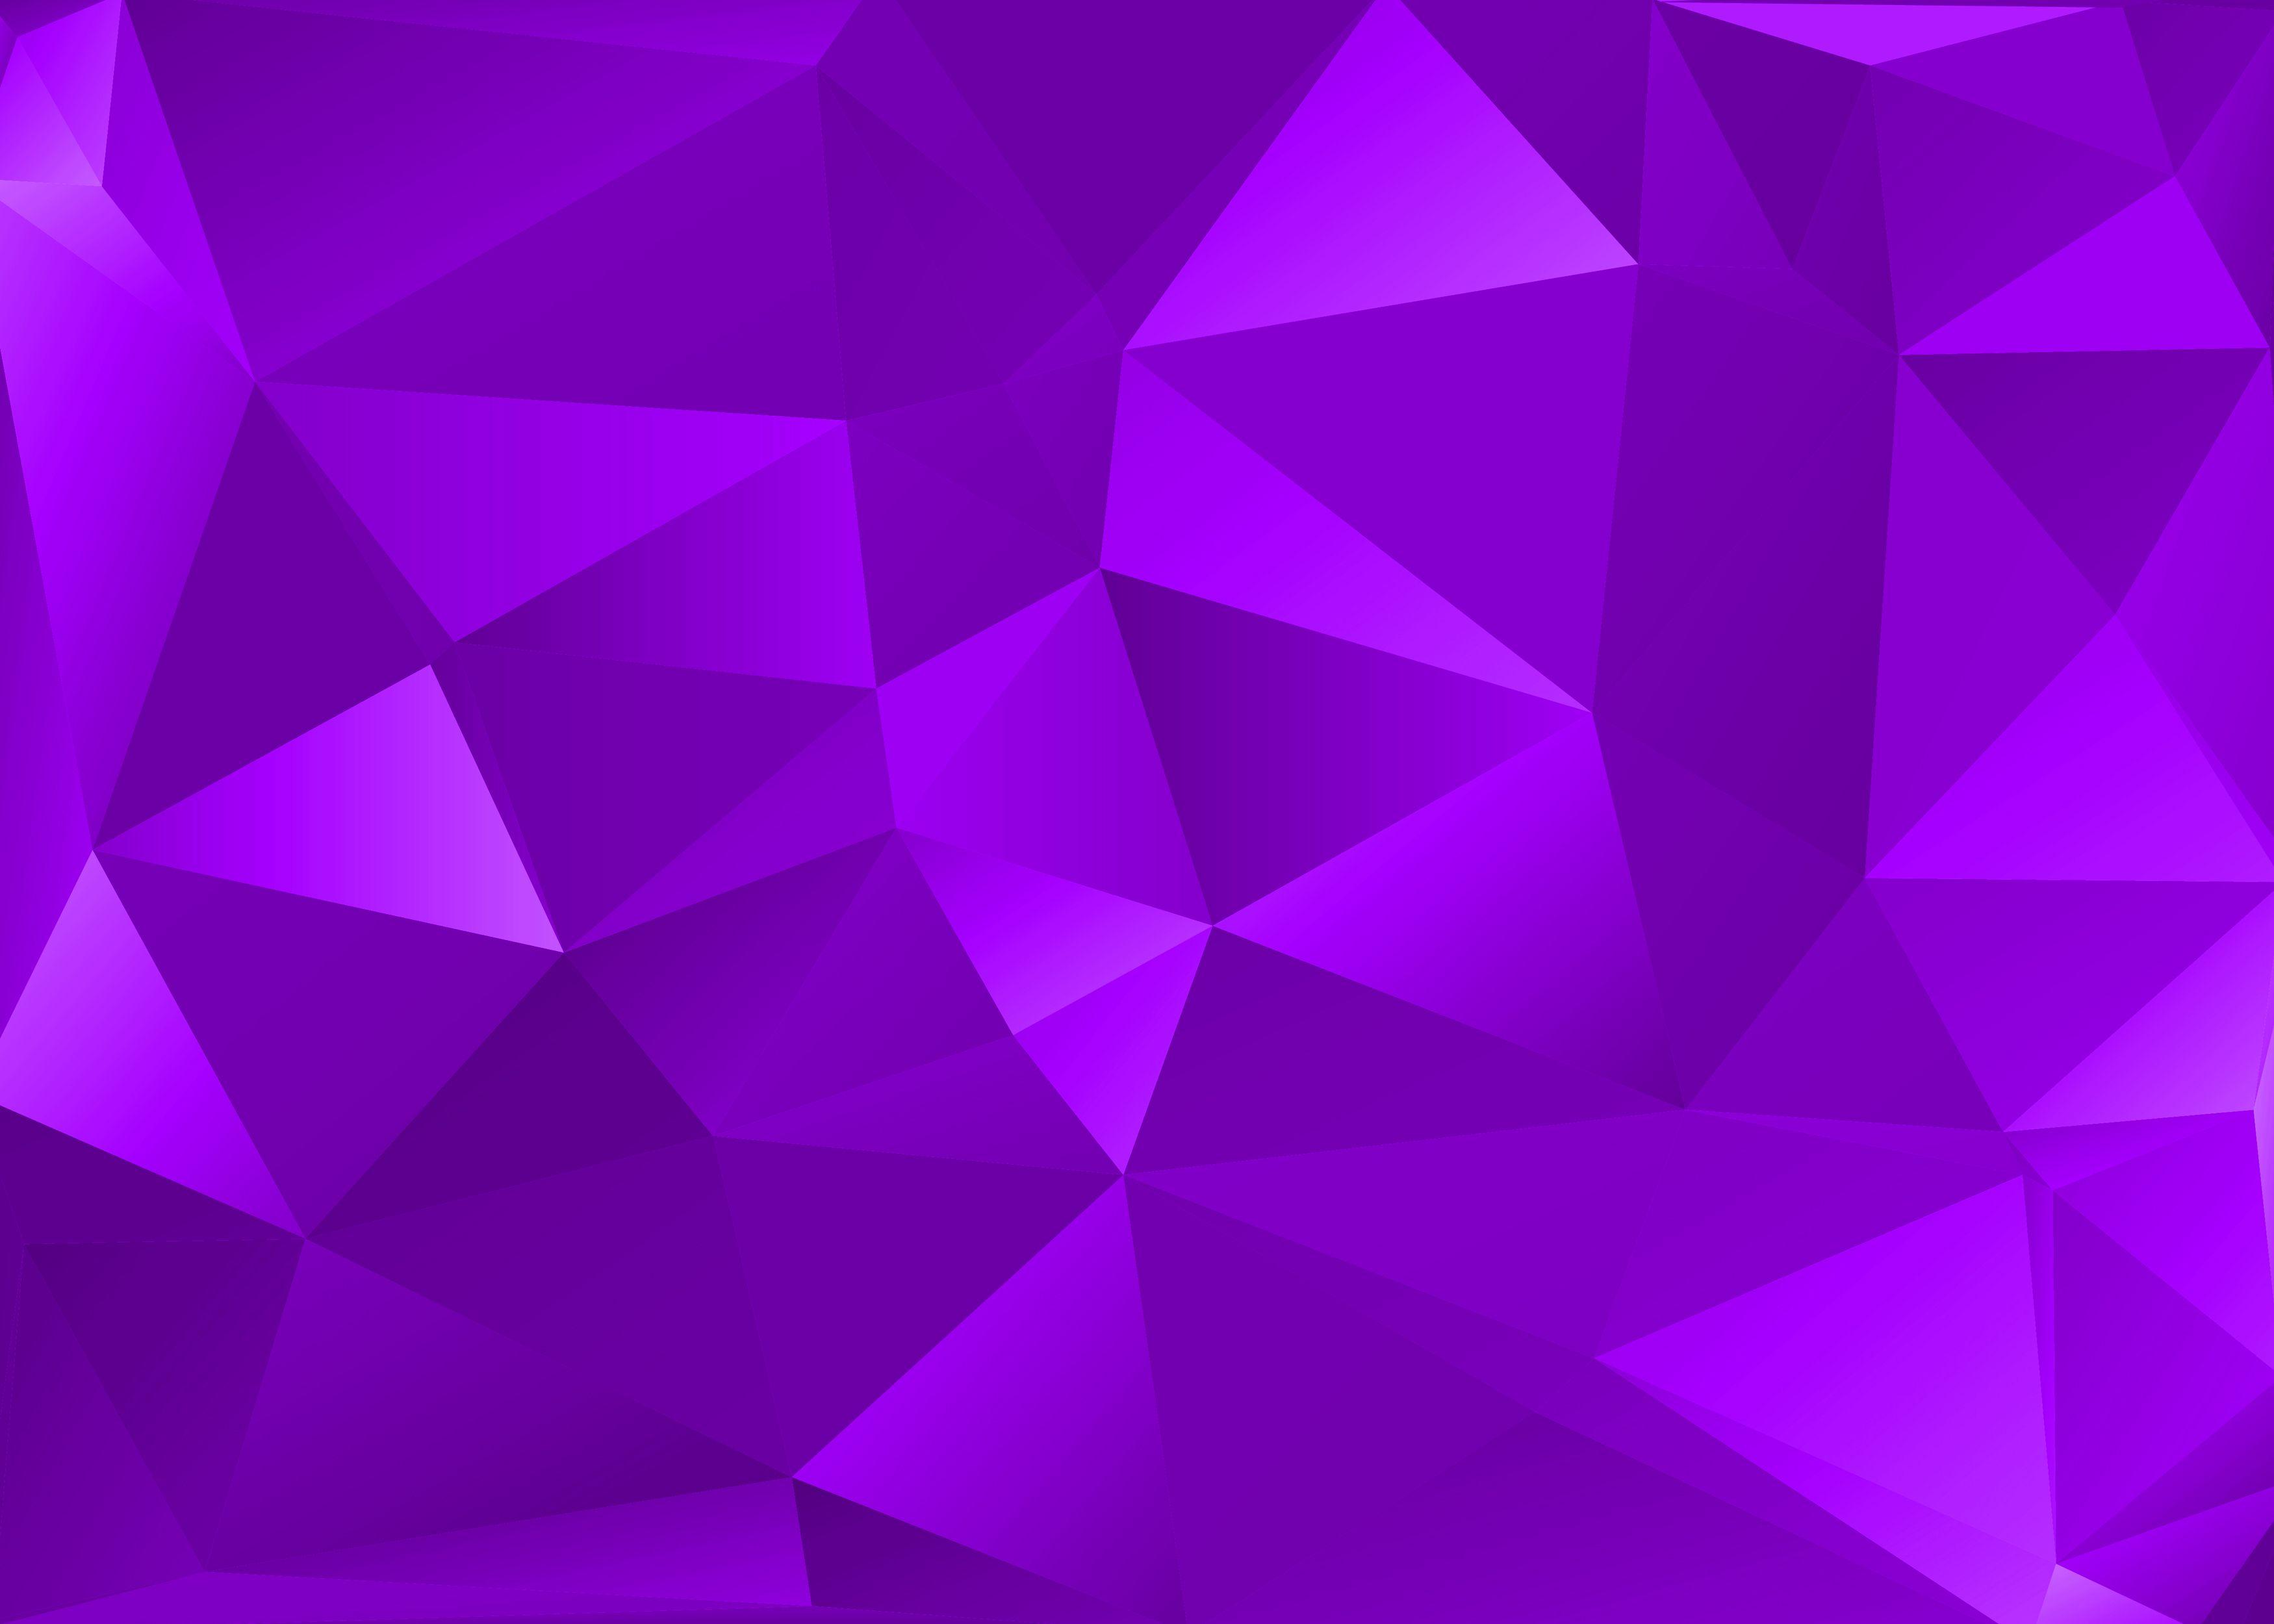 Background Purple 23 Jpg 3500 2500 Purple Background Images Purple Backgrounds Purple